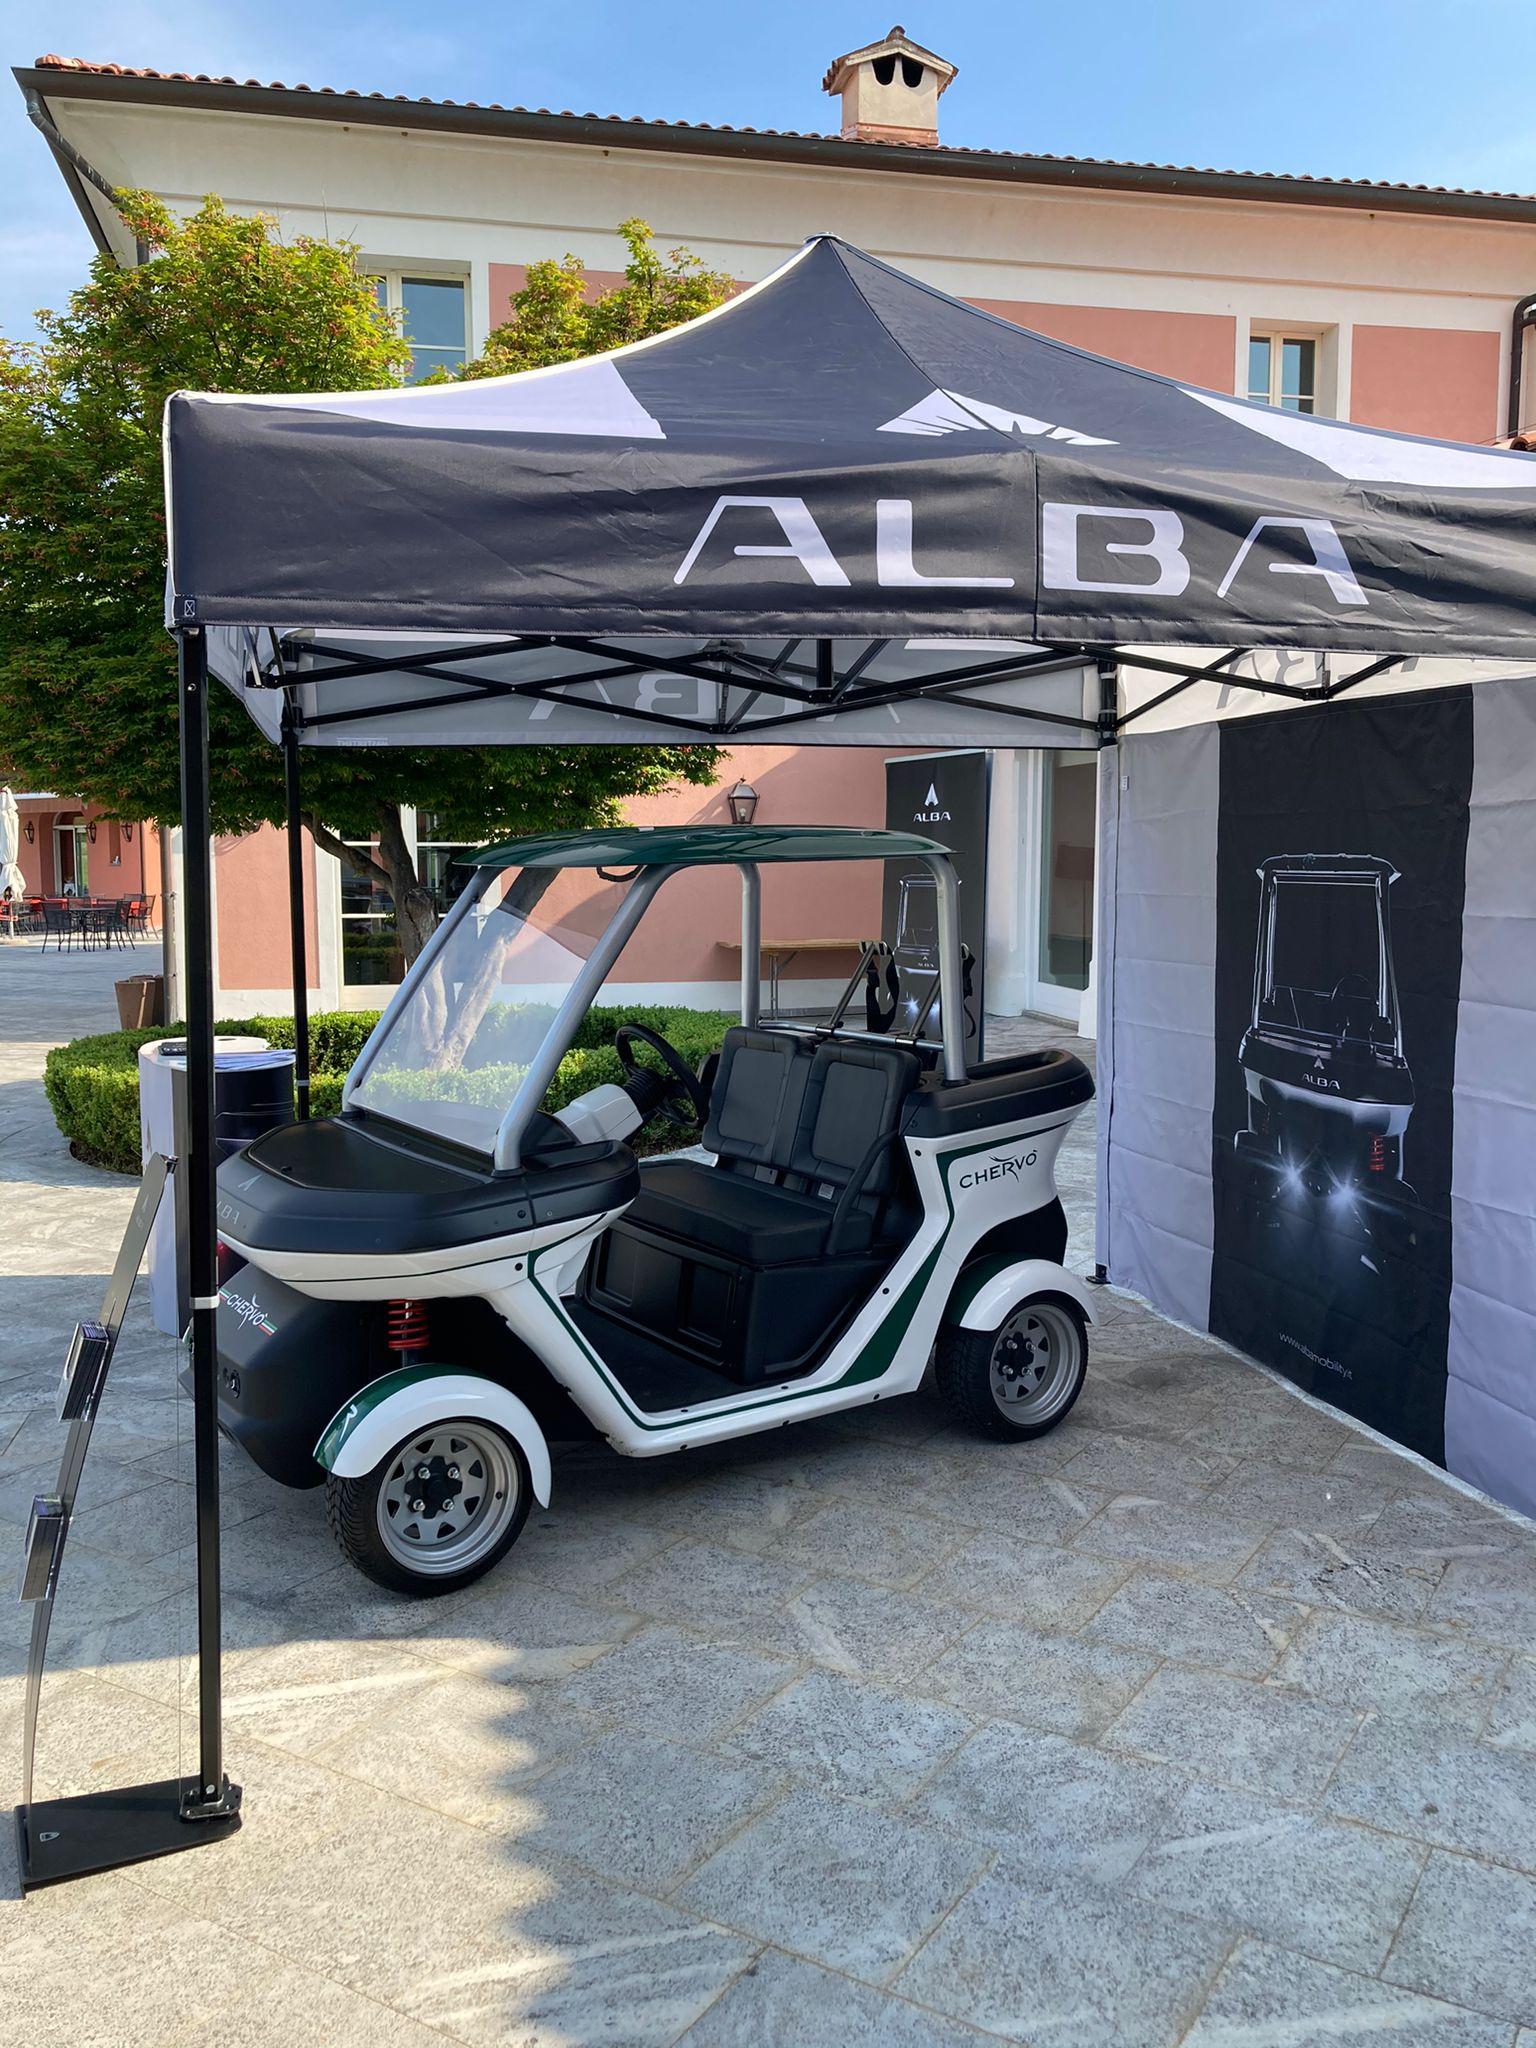 Alba stand - Bogogno golf club